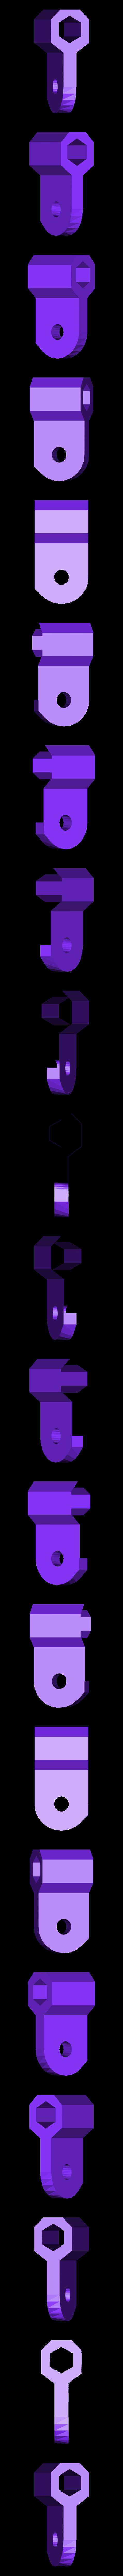 34-alternative_rear_arm_bracket_hex_x2.stl Download free STL file OpenRC Tractor • 3D printable object, makitpro